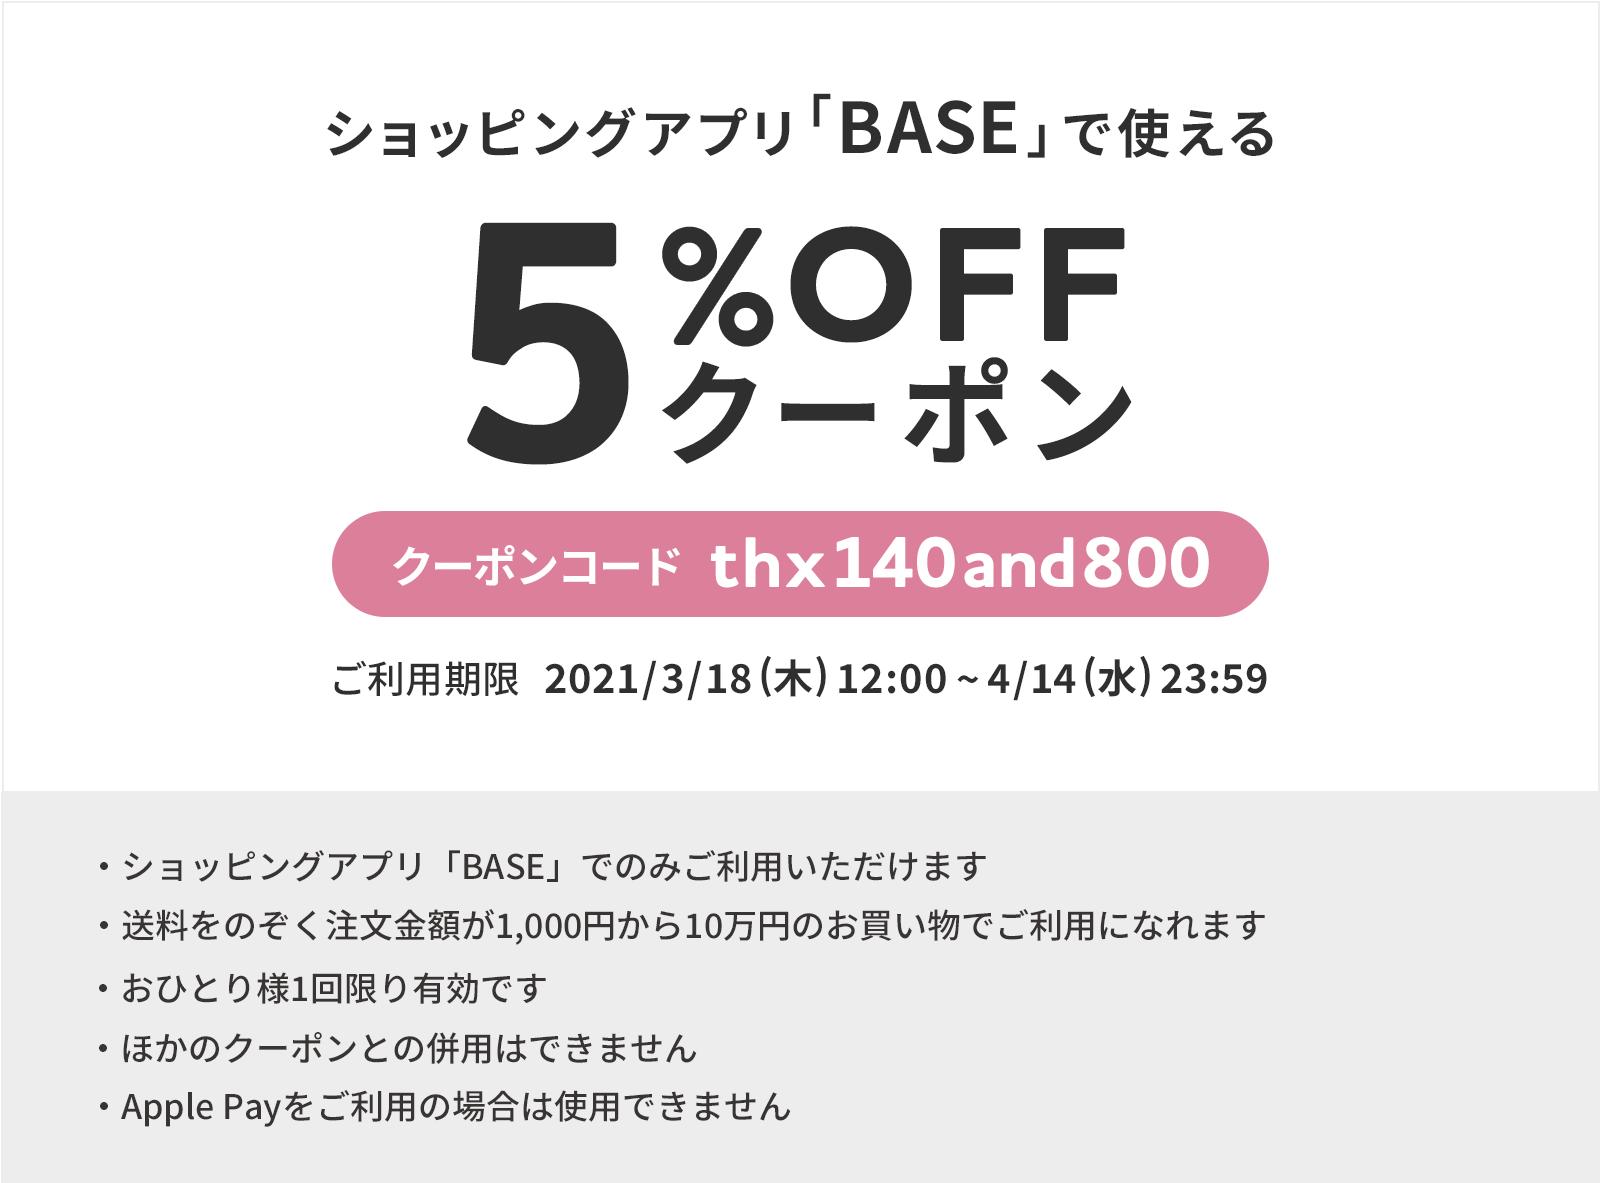 BASEのアニバーサリークーポンで5%OFFに! クーポンコード thx140and800